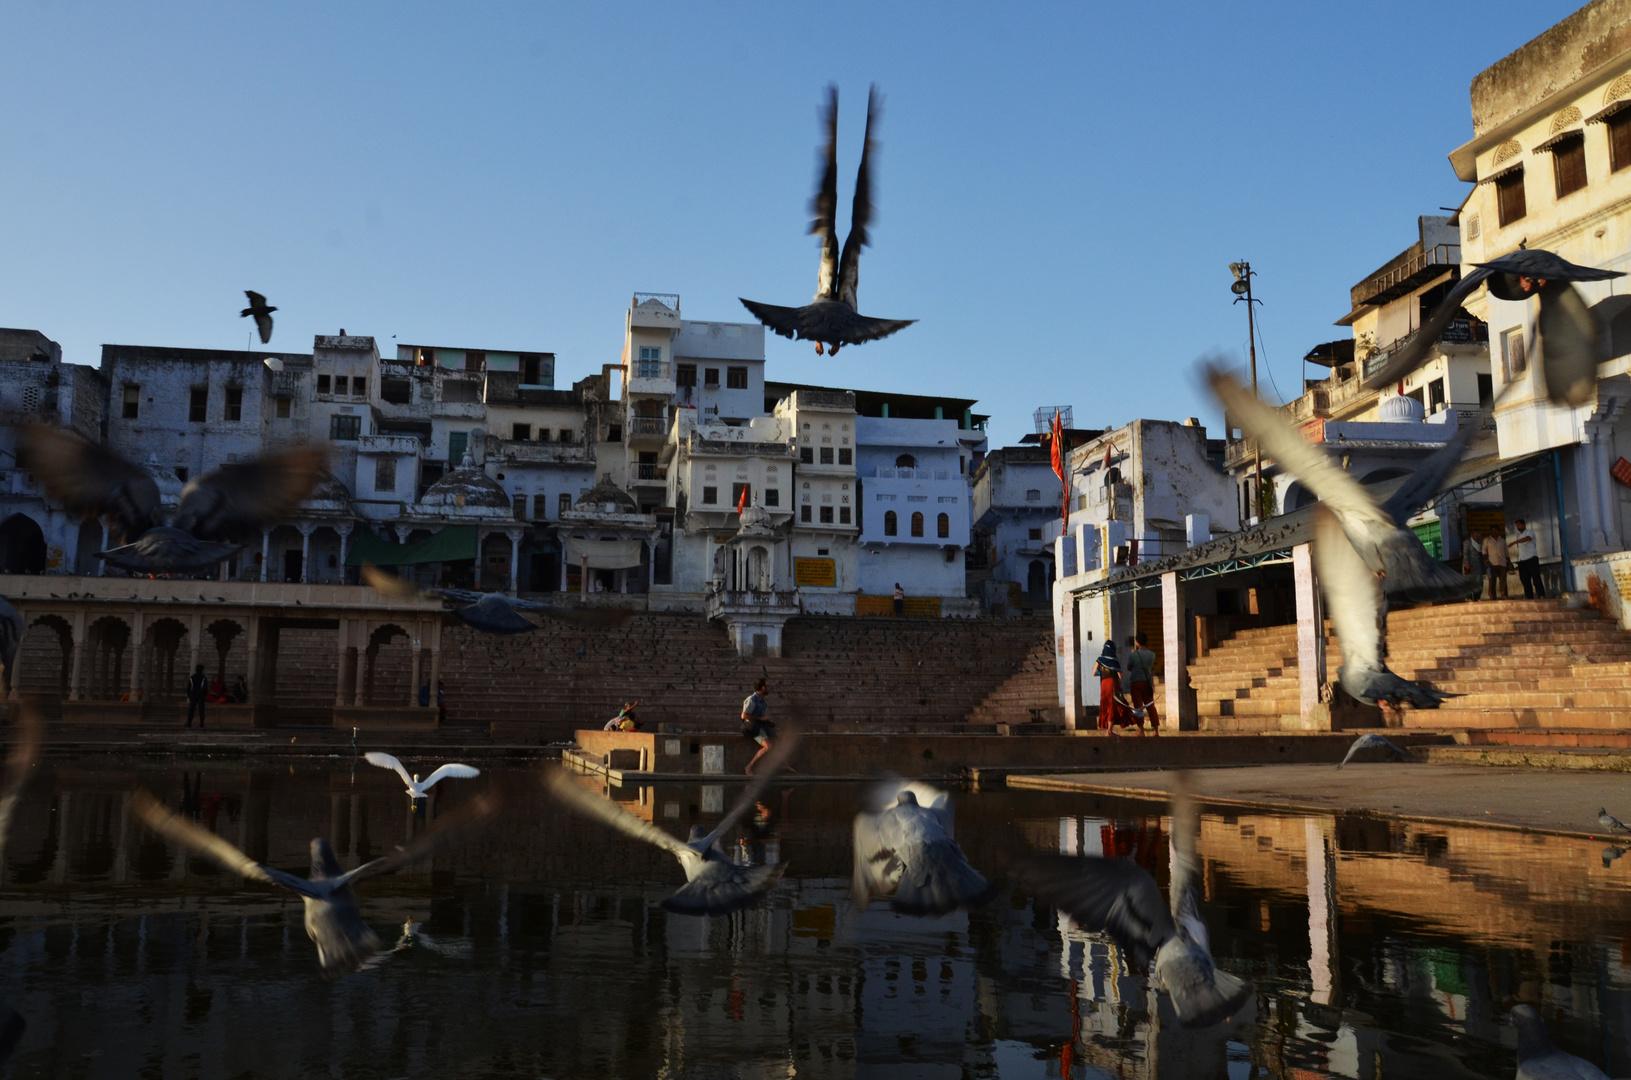 Landung in Pushkar erfolgt in Kürze